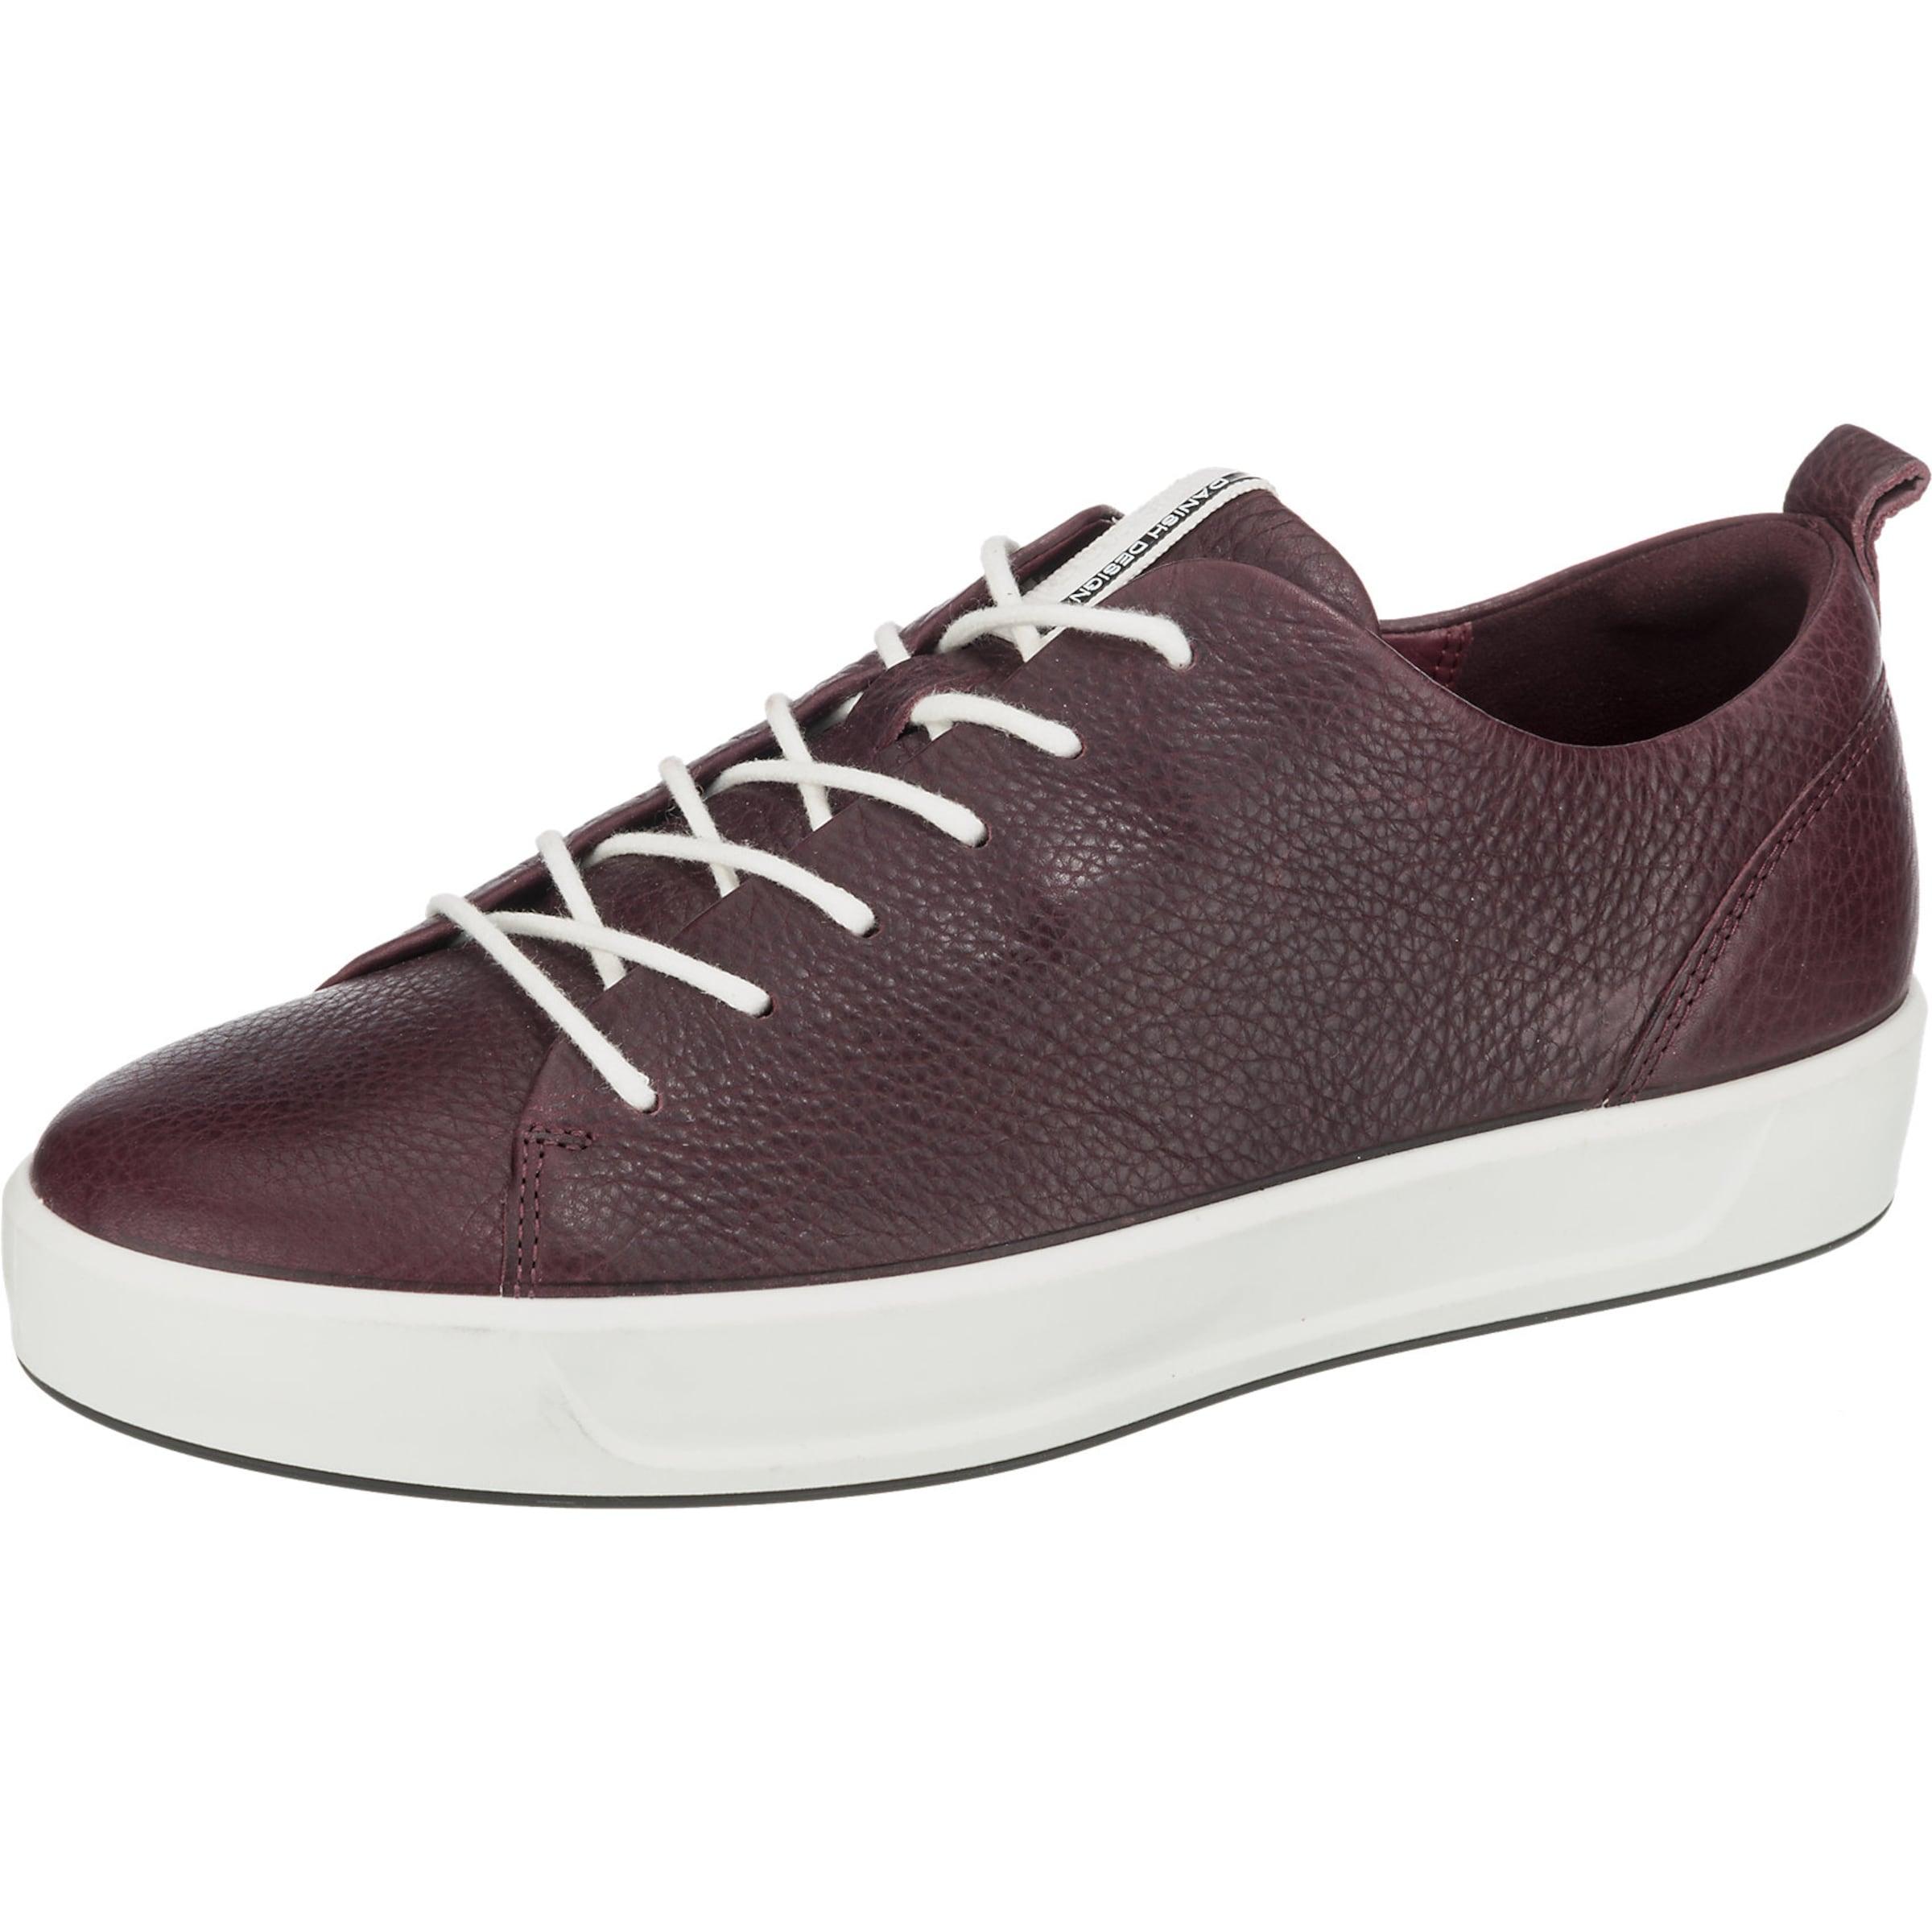 Sneakers Rotviolett Ecco 'soft 8' In b7gyf6